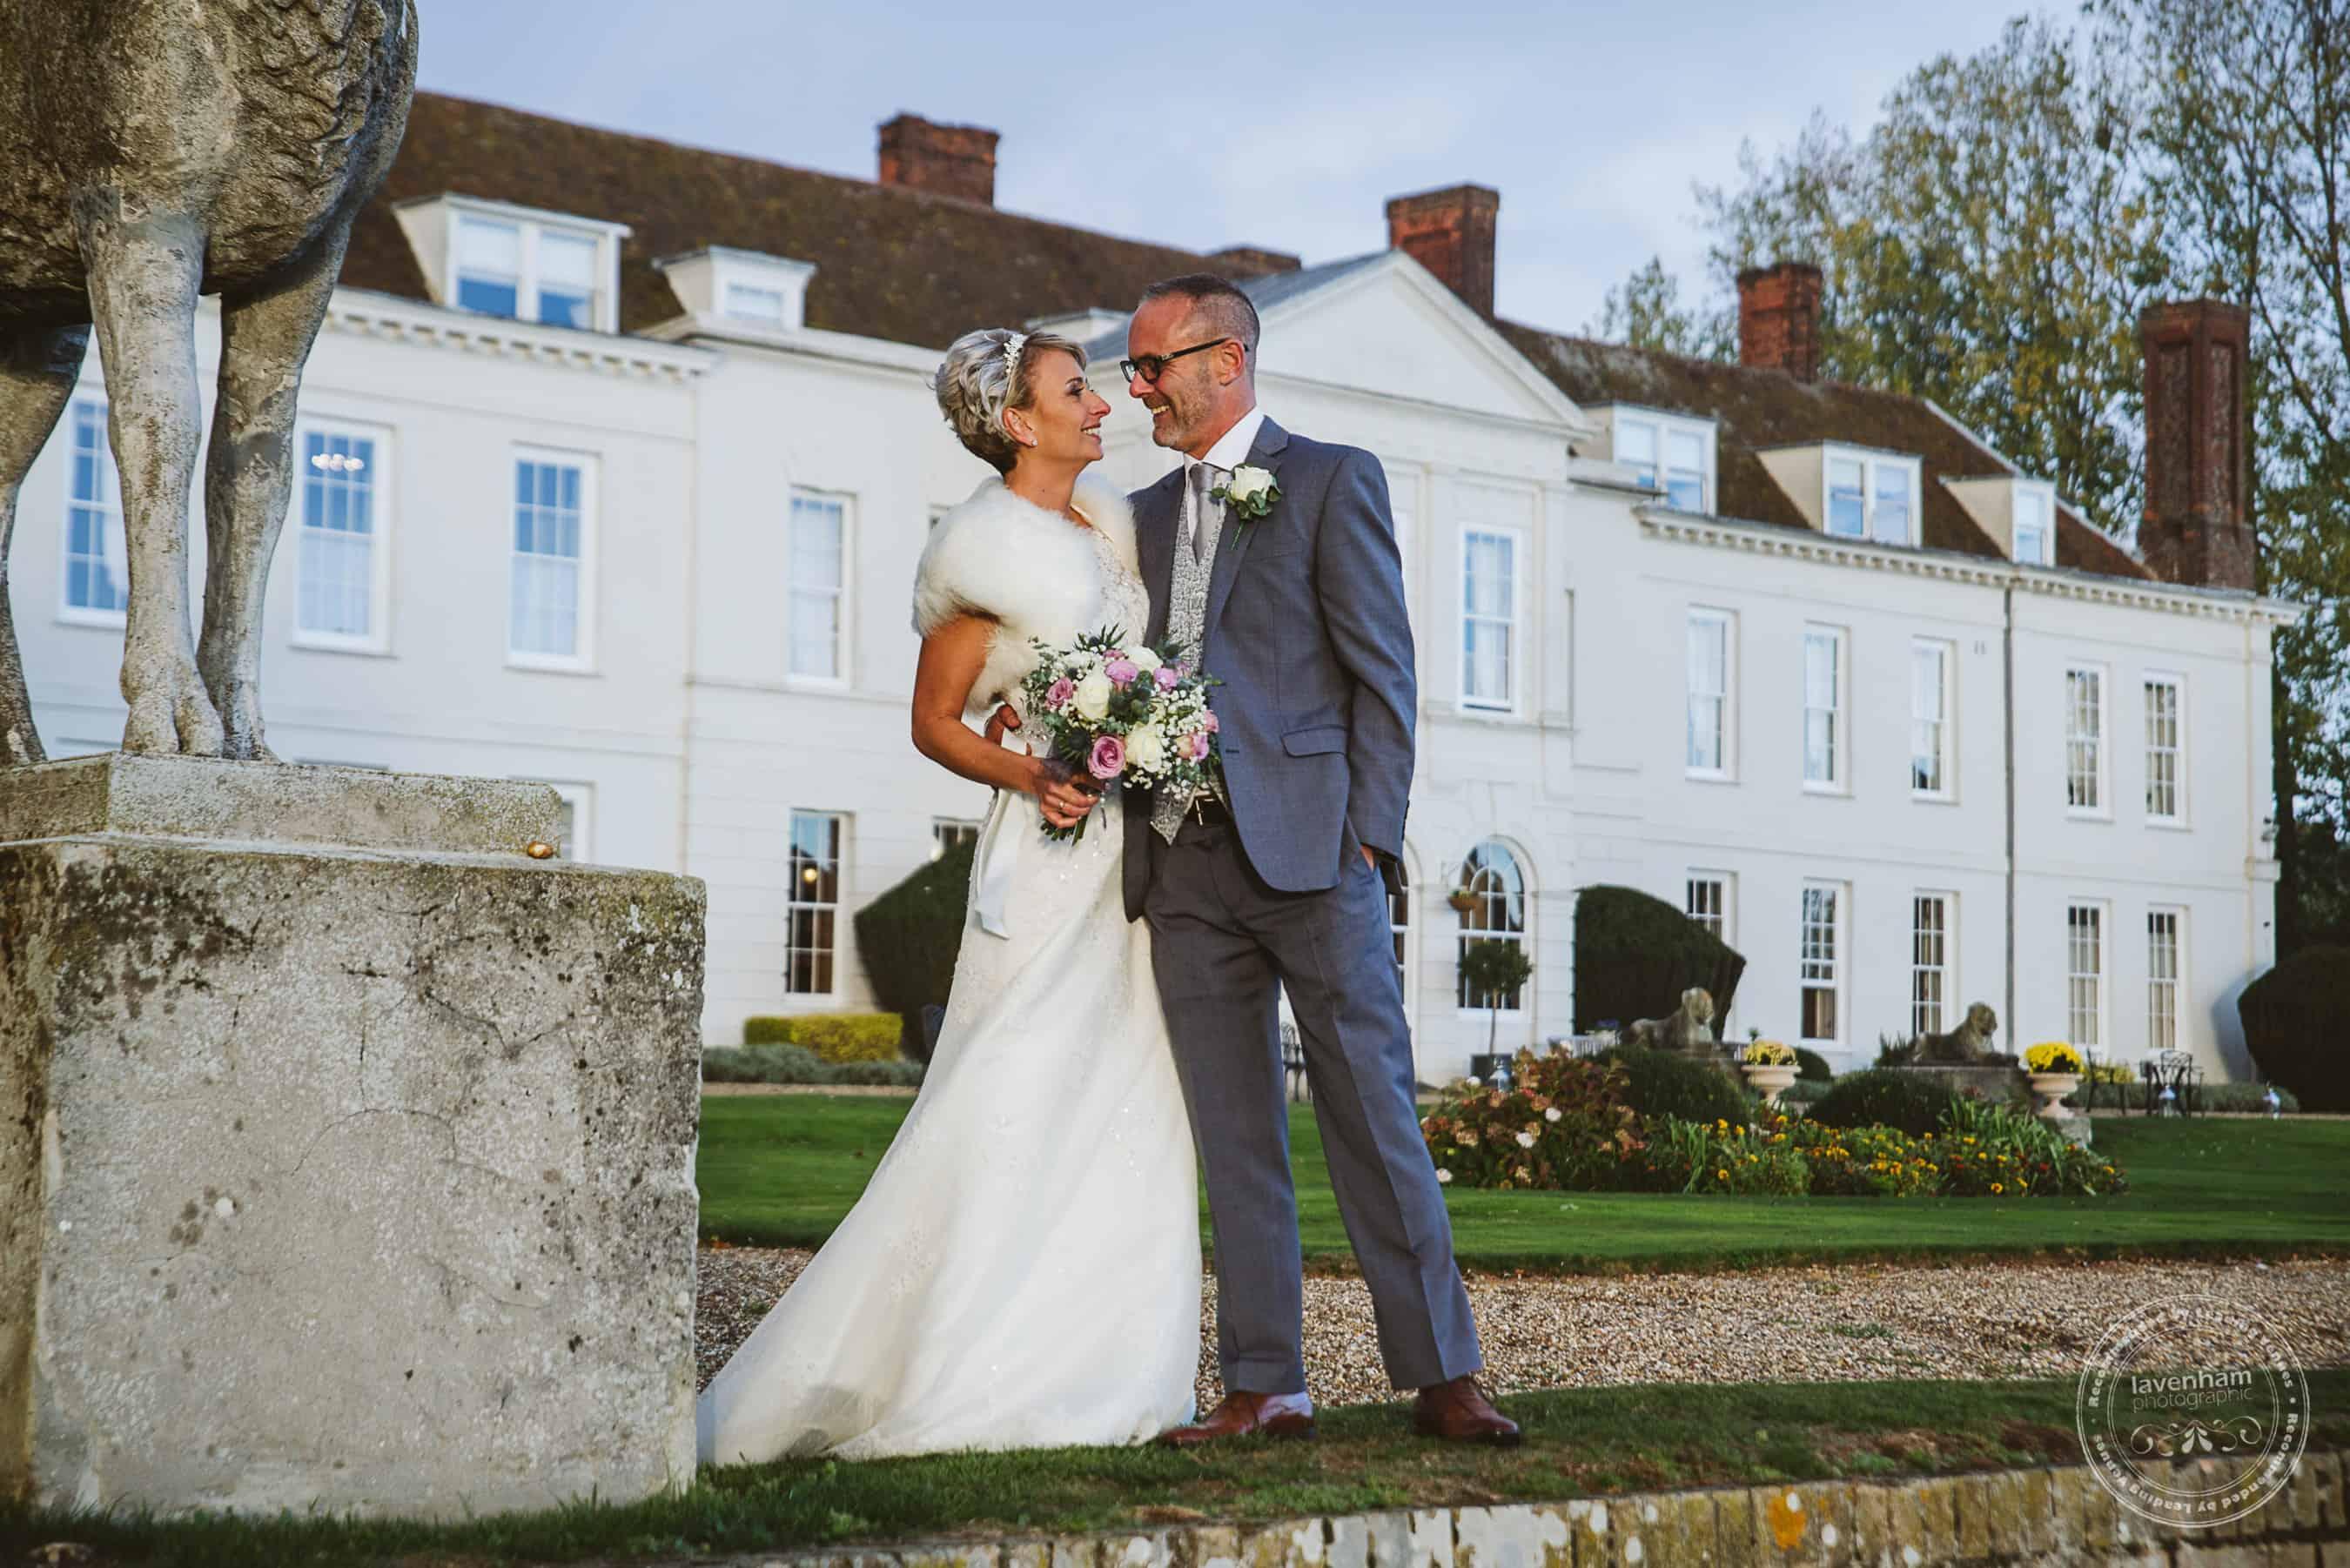 281018 Gosfield Hall Wedding Photography Lavenham Photographic 090